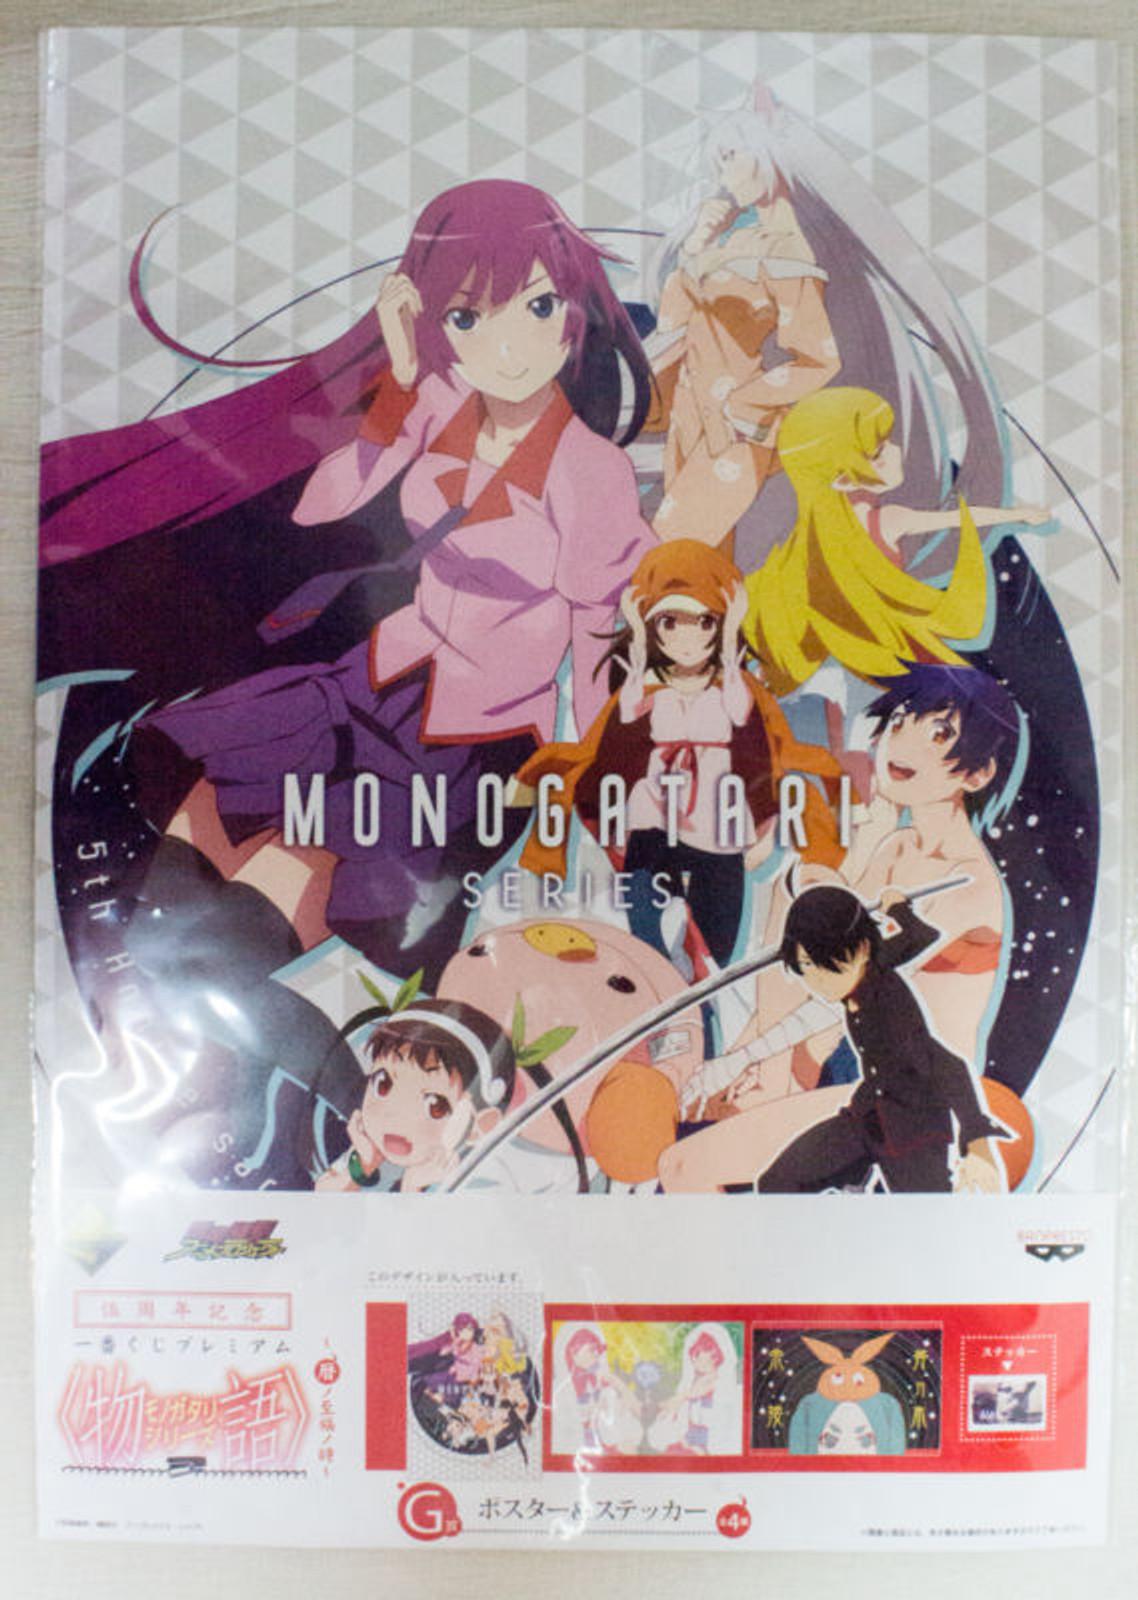 "Monogatari Siries 16"" Poster & Sticker Bakemonogatari JAPAN ANIME"